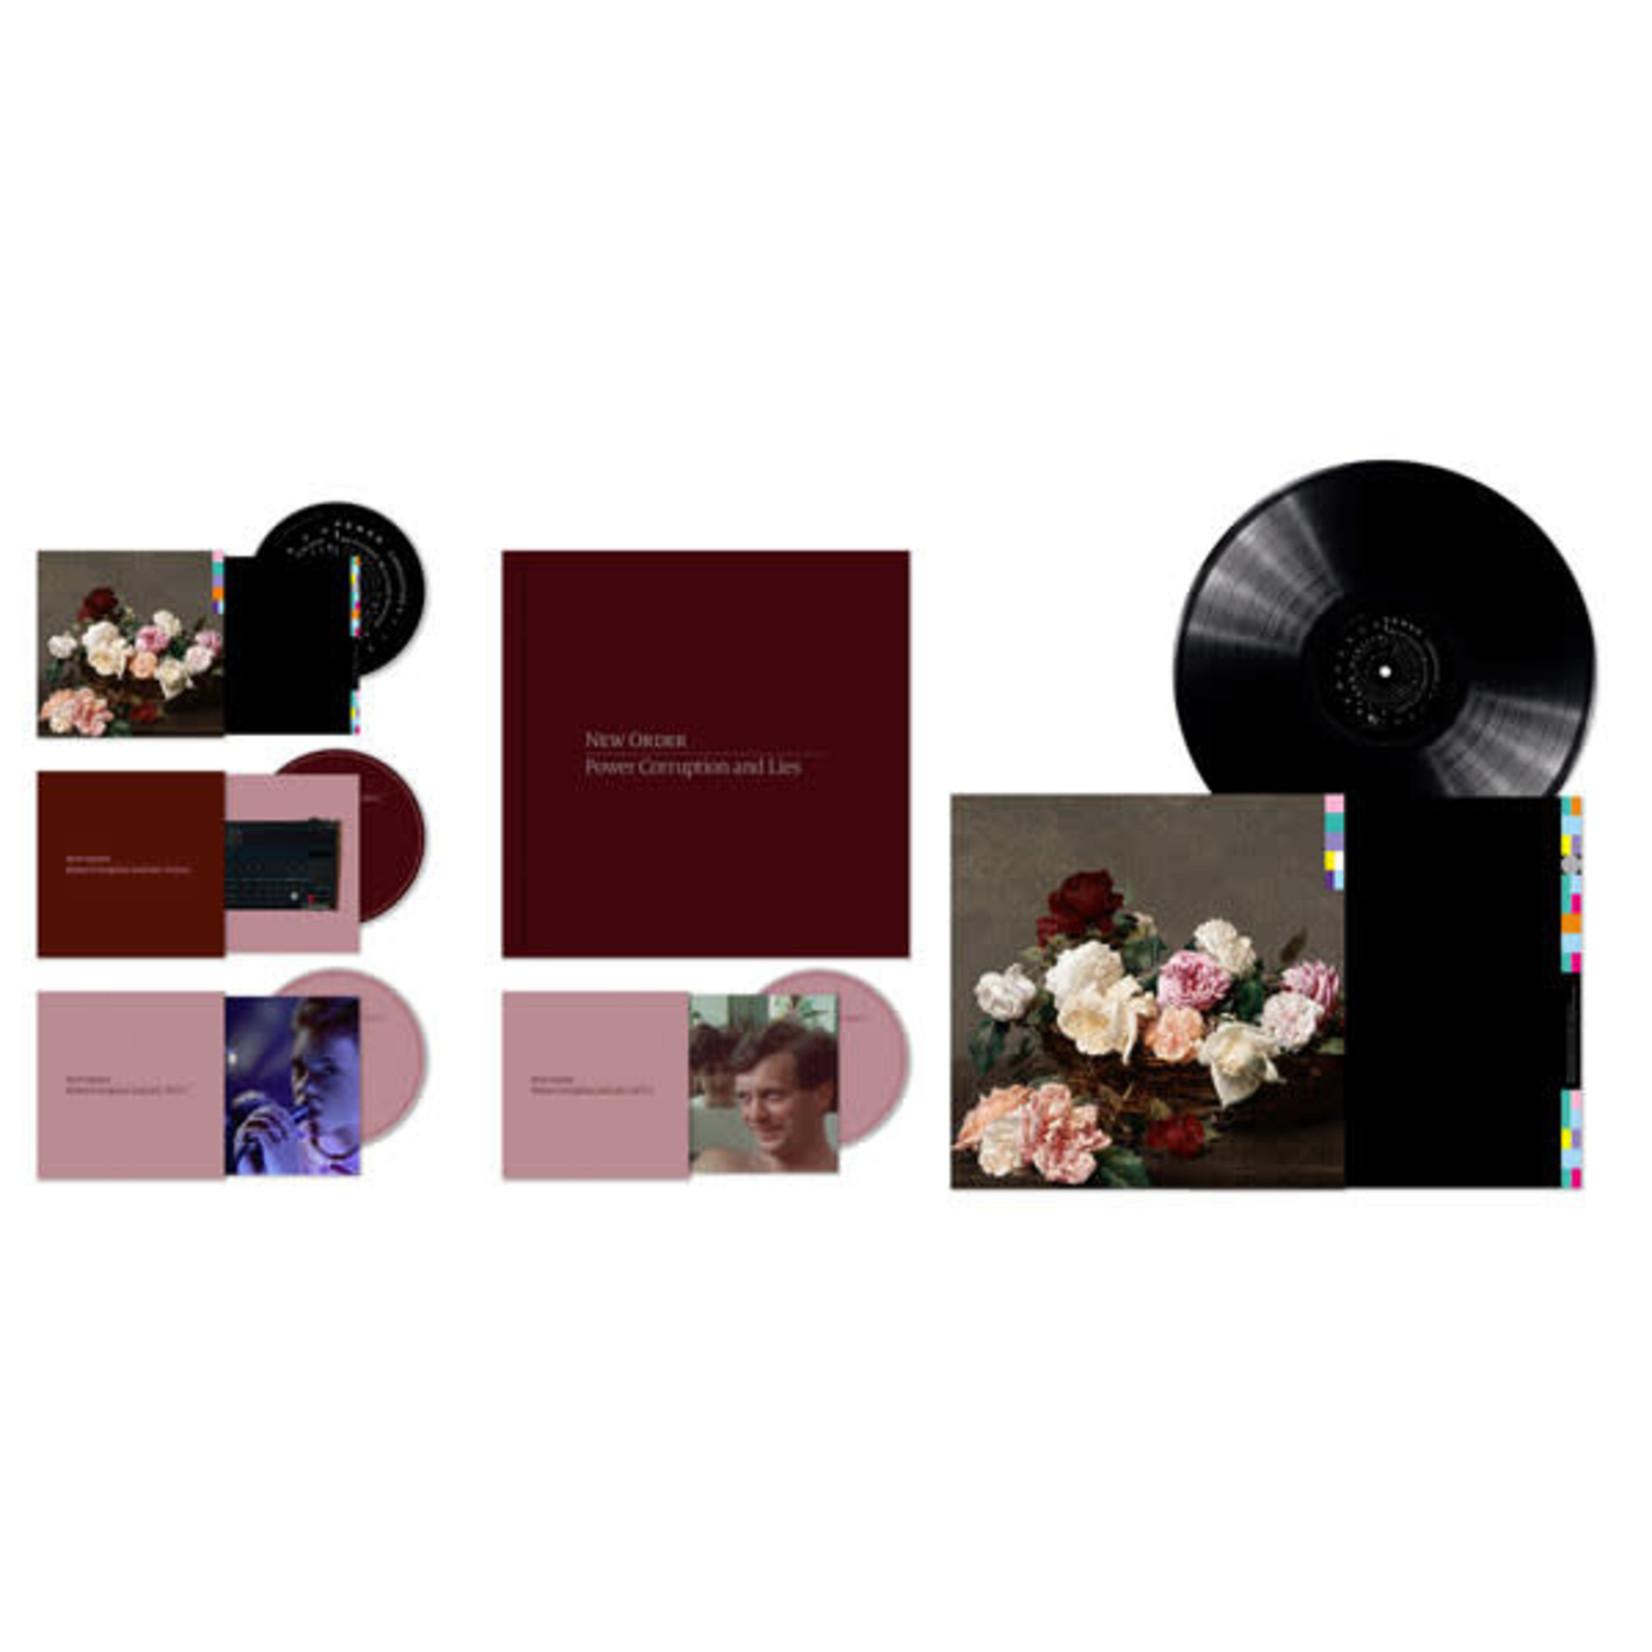 Vinyl Power Corruption and Lies (Definitive Edition)